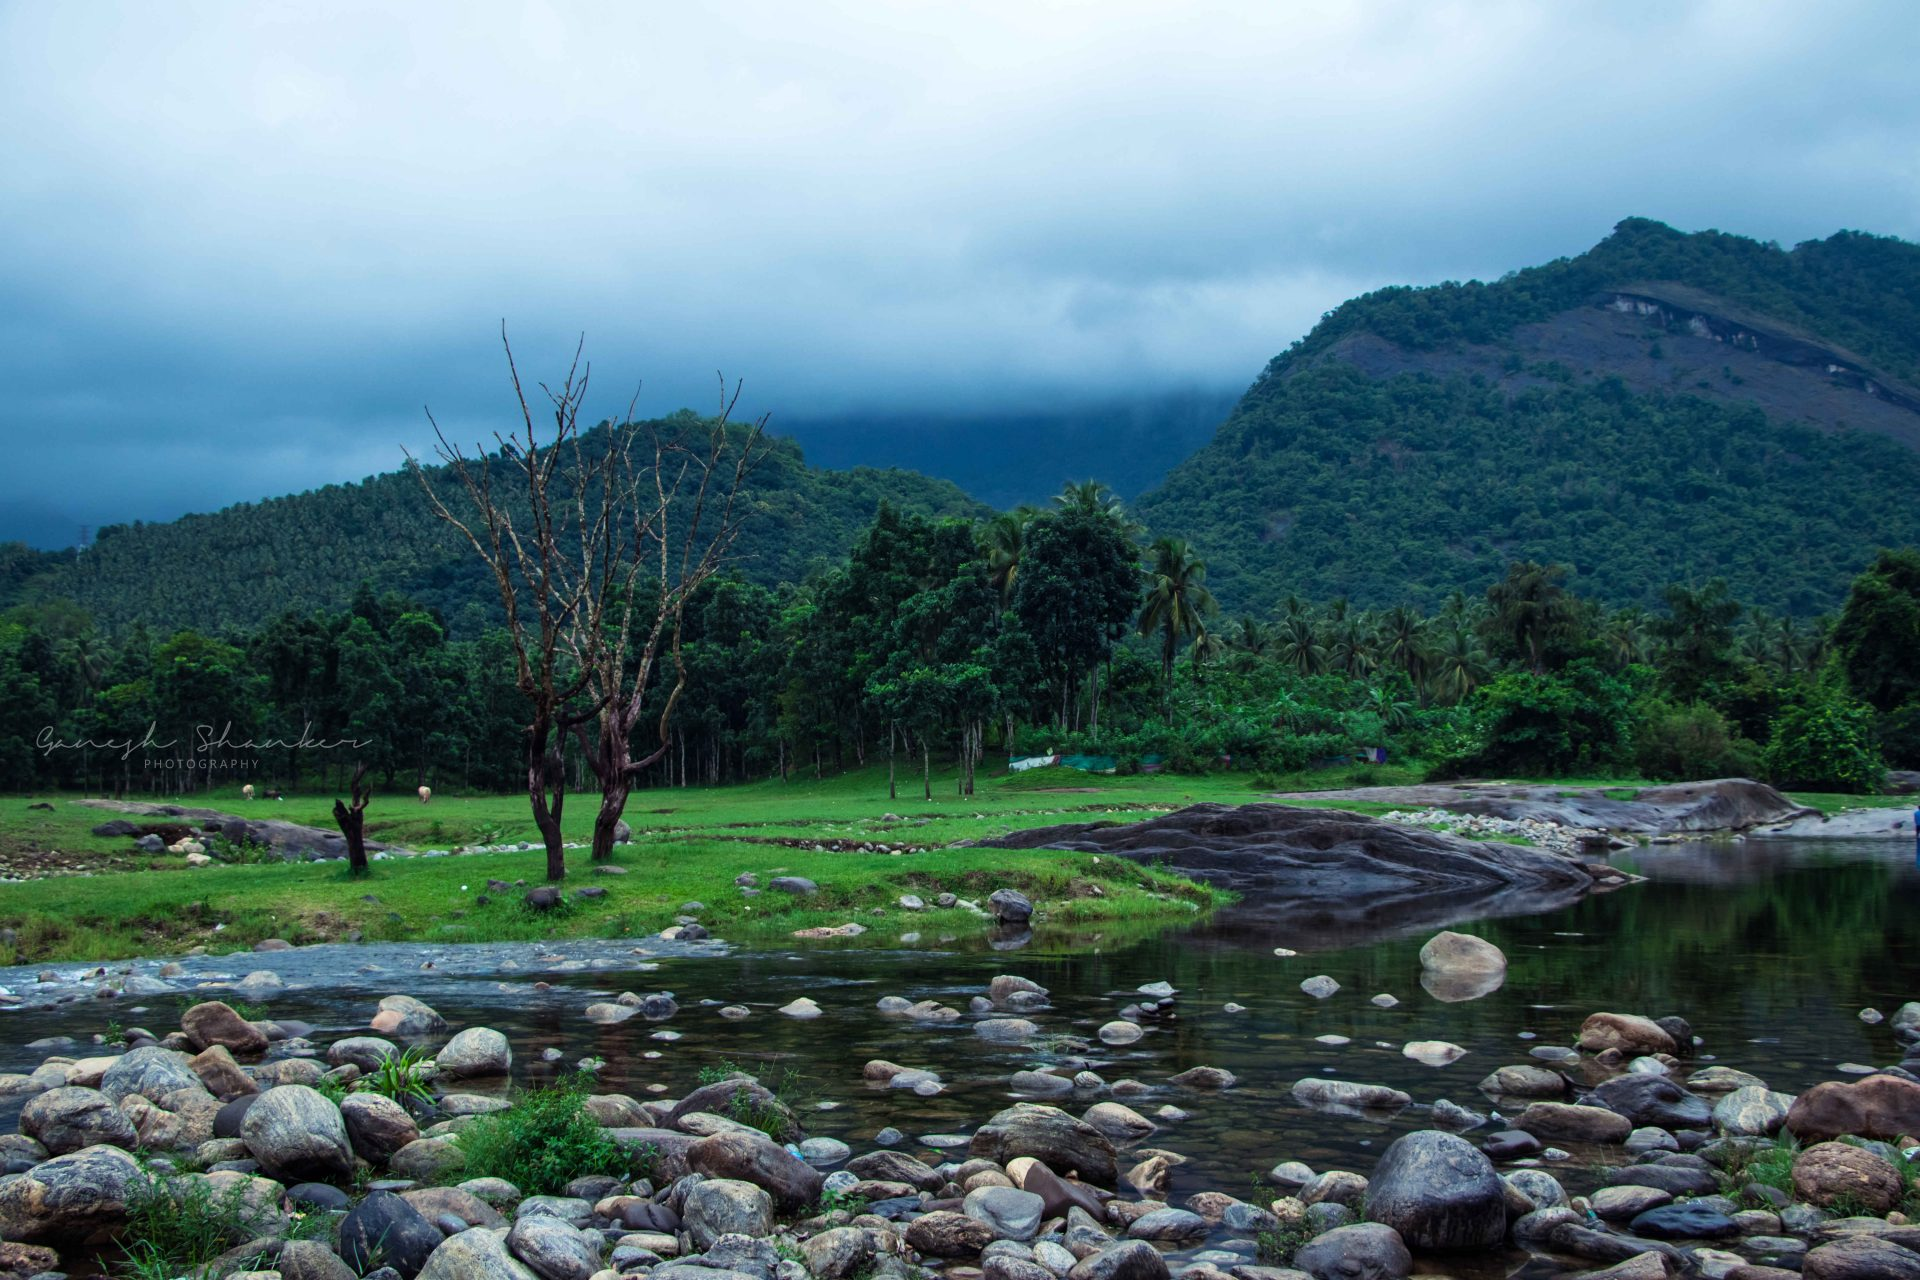 kakkayam-landscape-photo-ganesh-shanker-kk